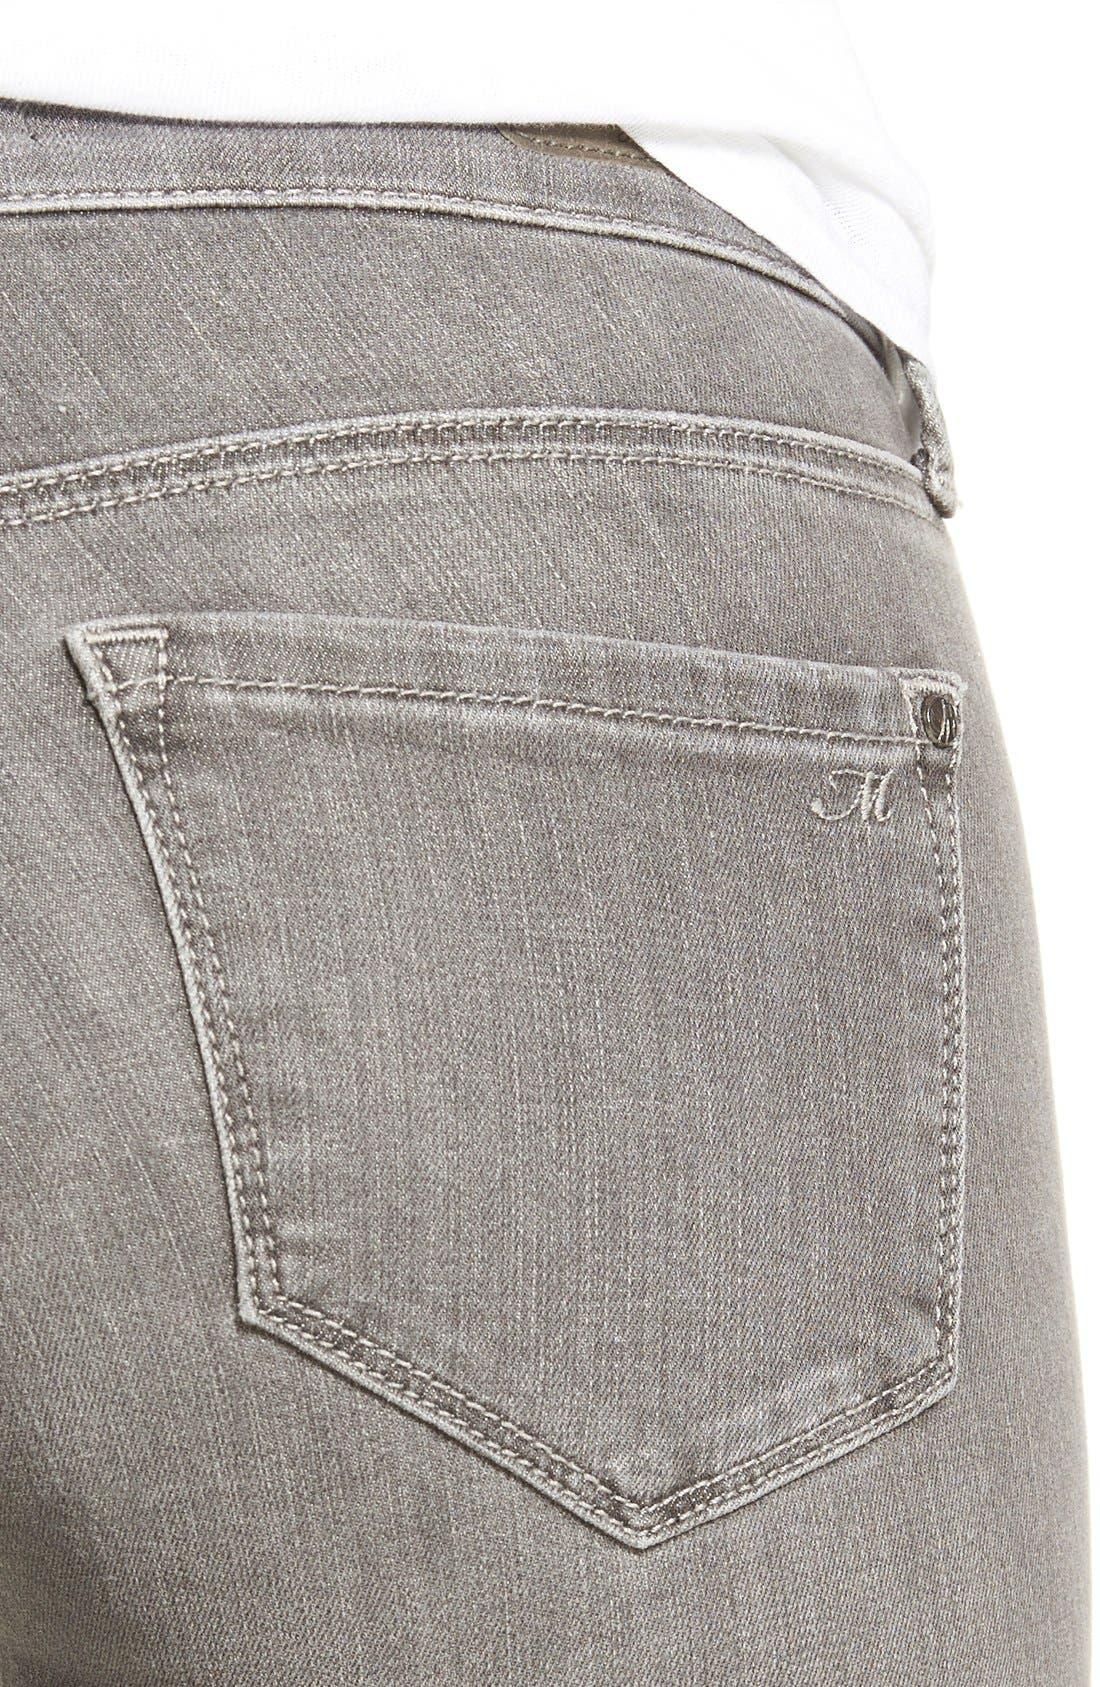 Alternate Image 4  - Mavi Jeans 'Serena' Distressed Stretch Skinny Jeans (Grey Ripped)